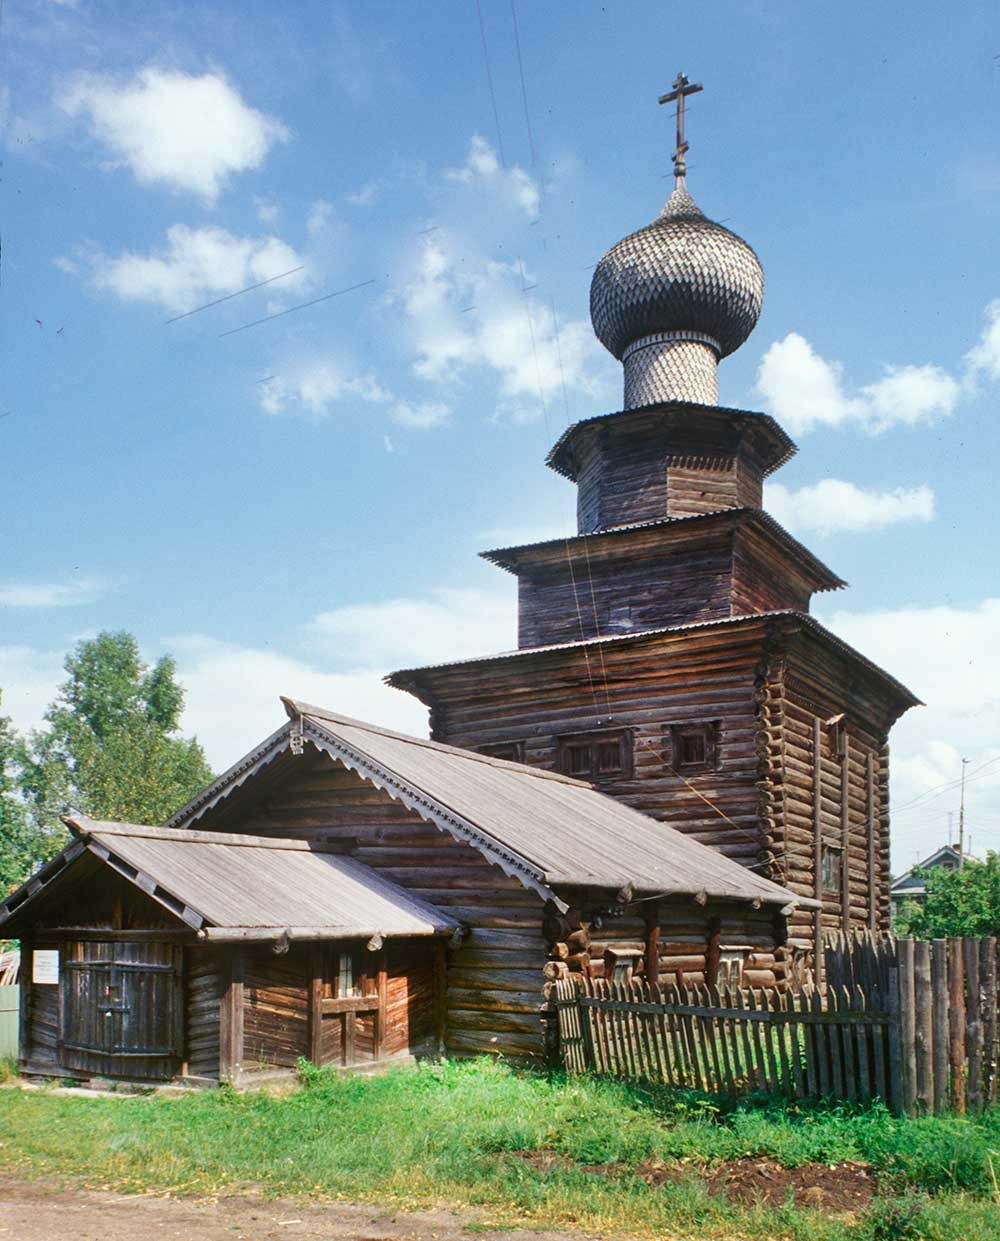 Chiesa del profeta Elia, vista sud-ovest. 23 luglio 1999